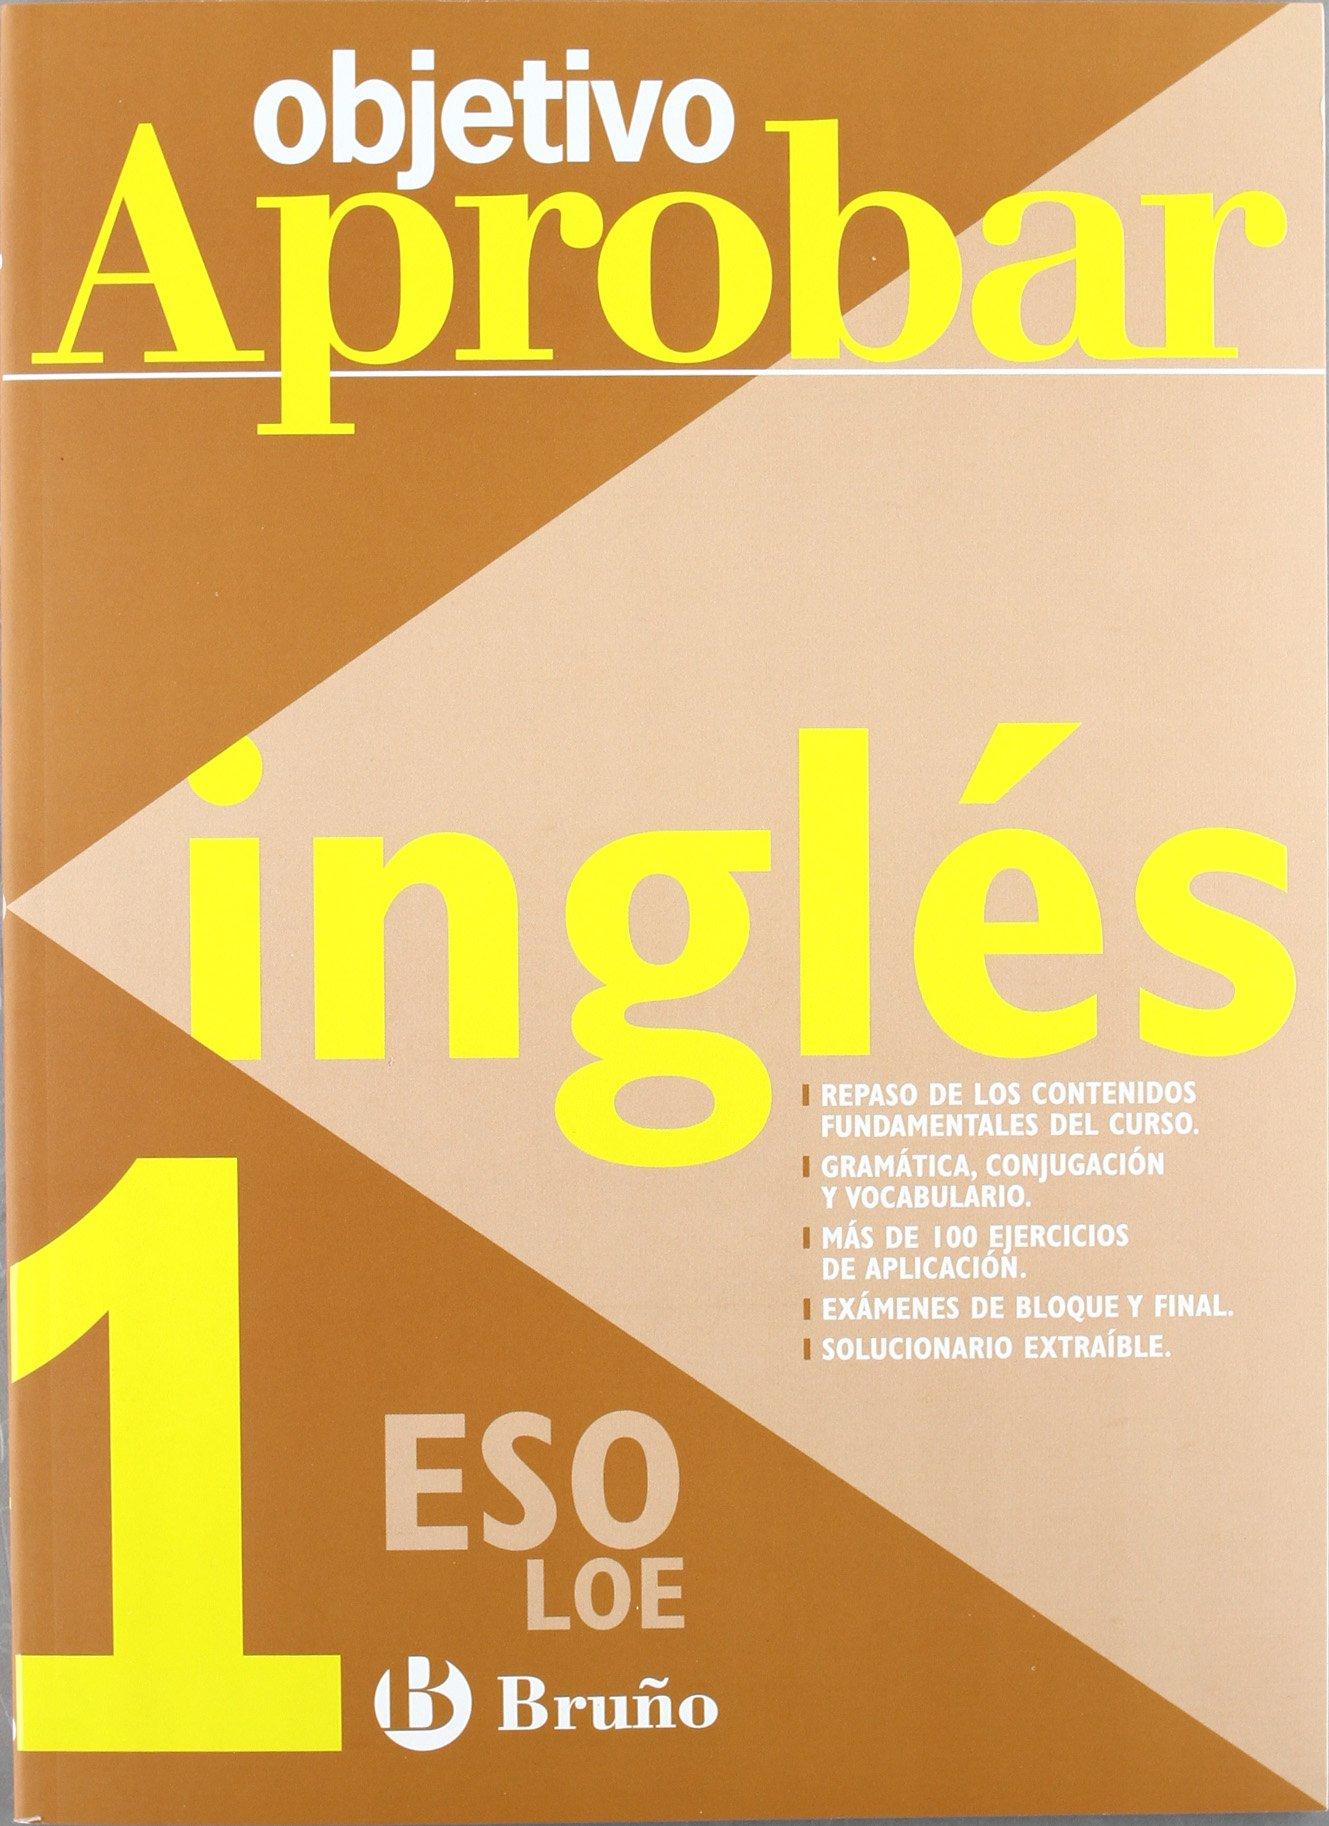 Download Objetivo aprobar inglés / Goal Approve English: ESO LOE (Spanish Edition) pdf